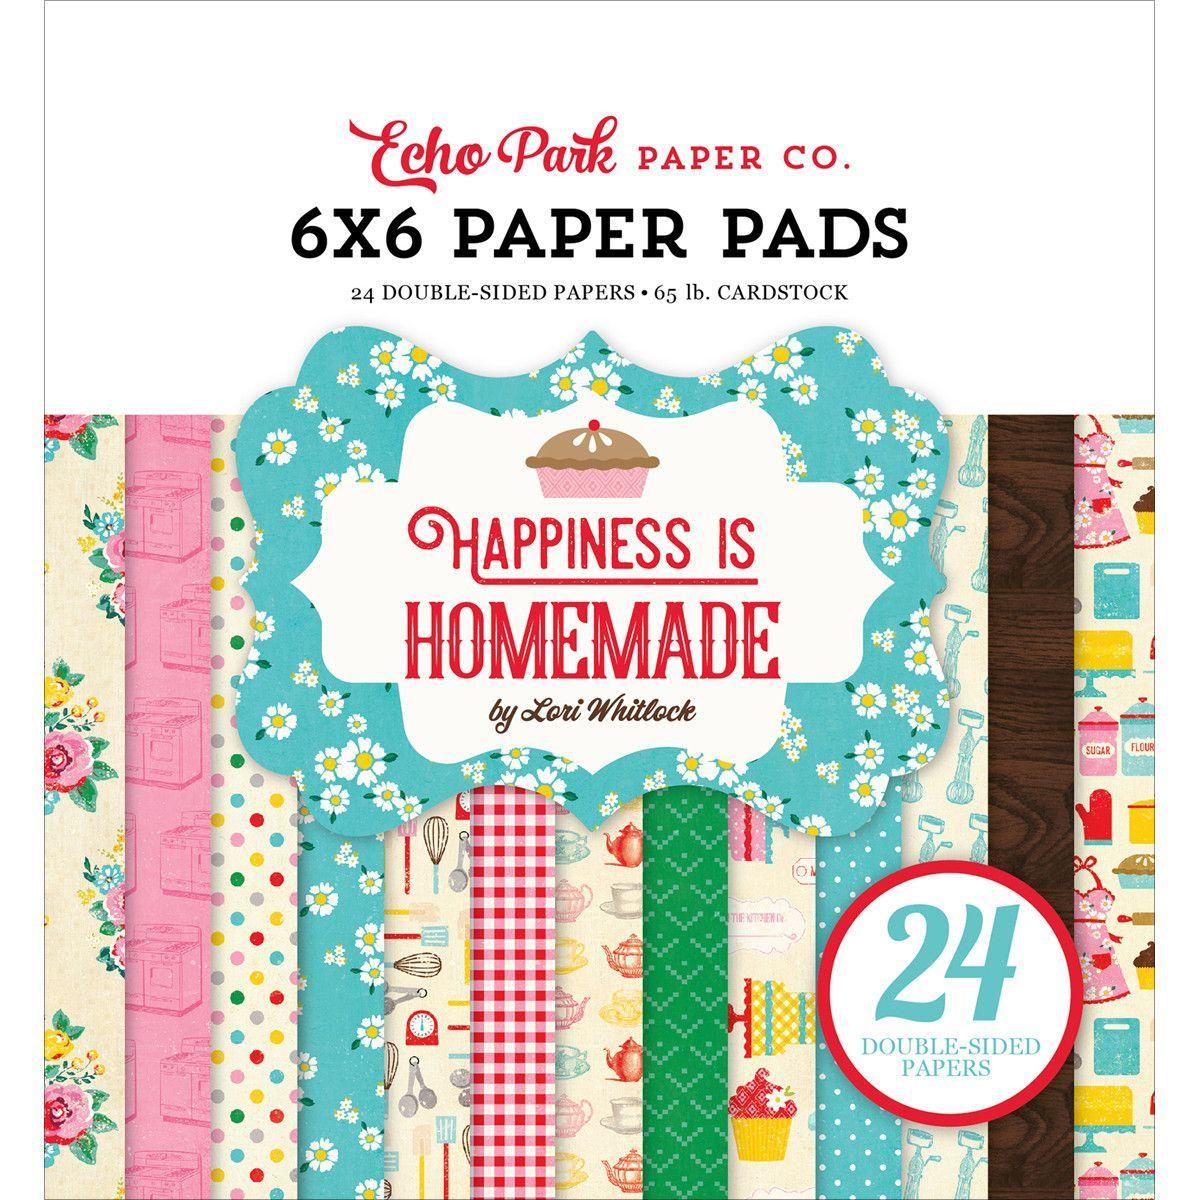 Scrapbook paper echo park - Echo Park Paper Happiness Is Homemade Paper Pad